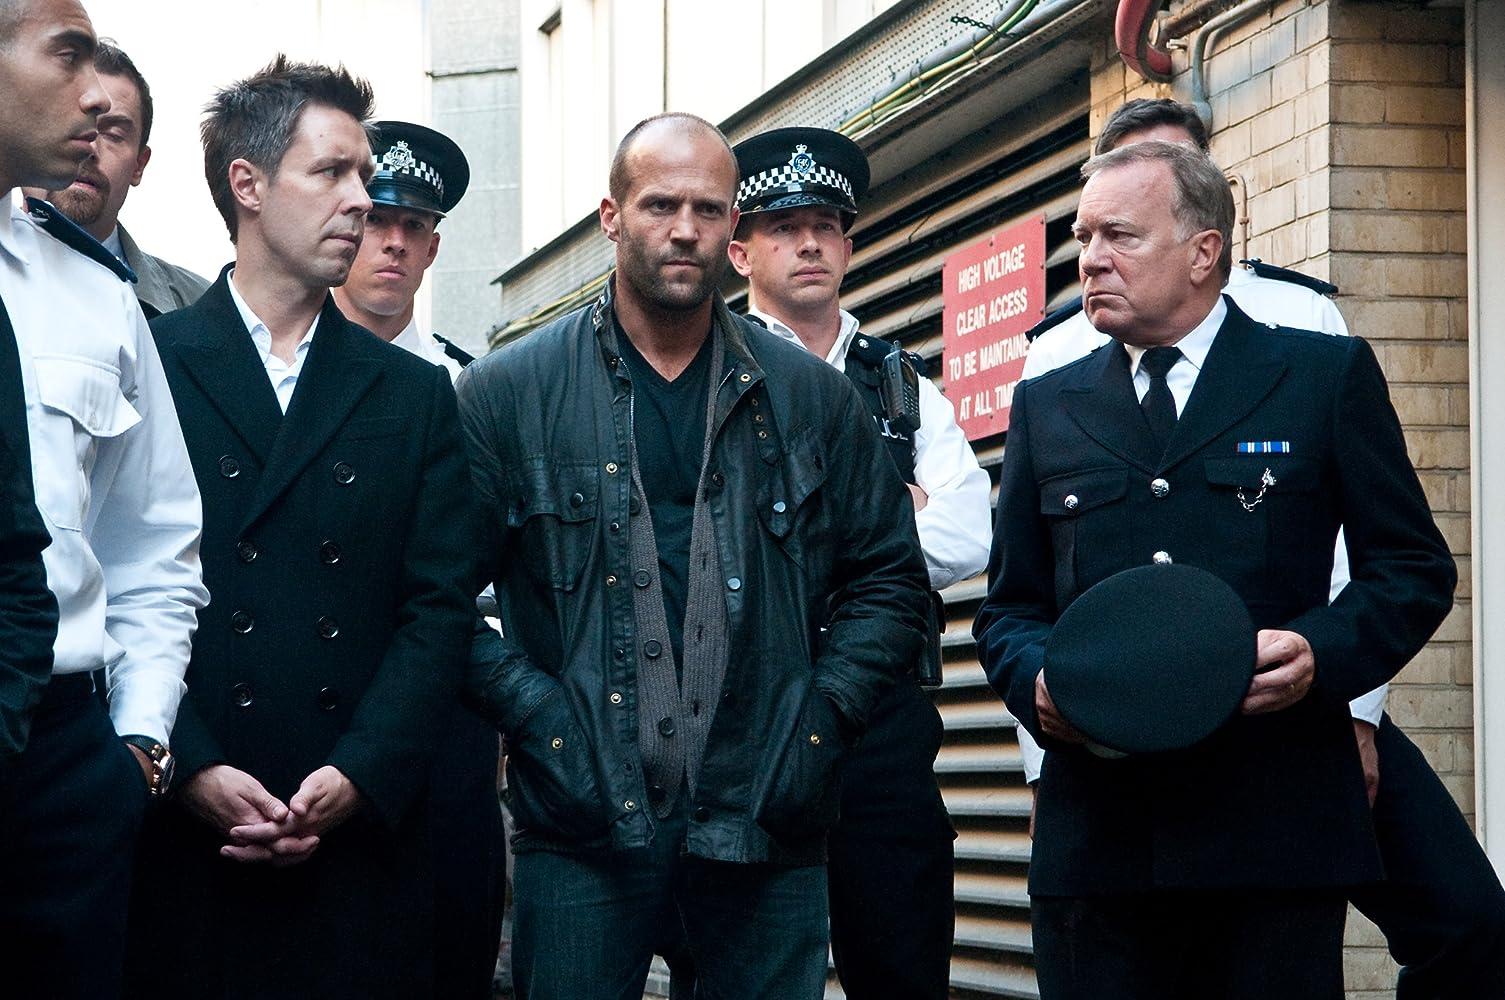 Jason Statham and Paddy Considine in Blitz (2011)